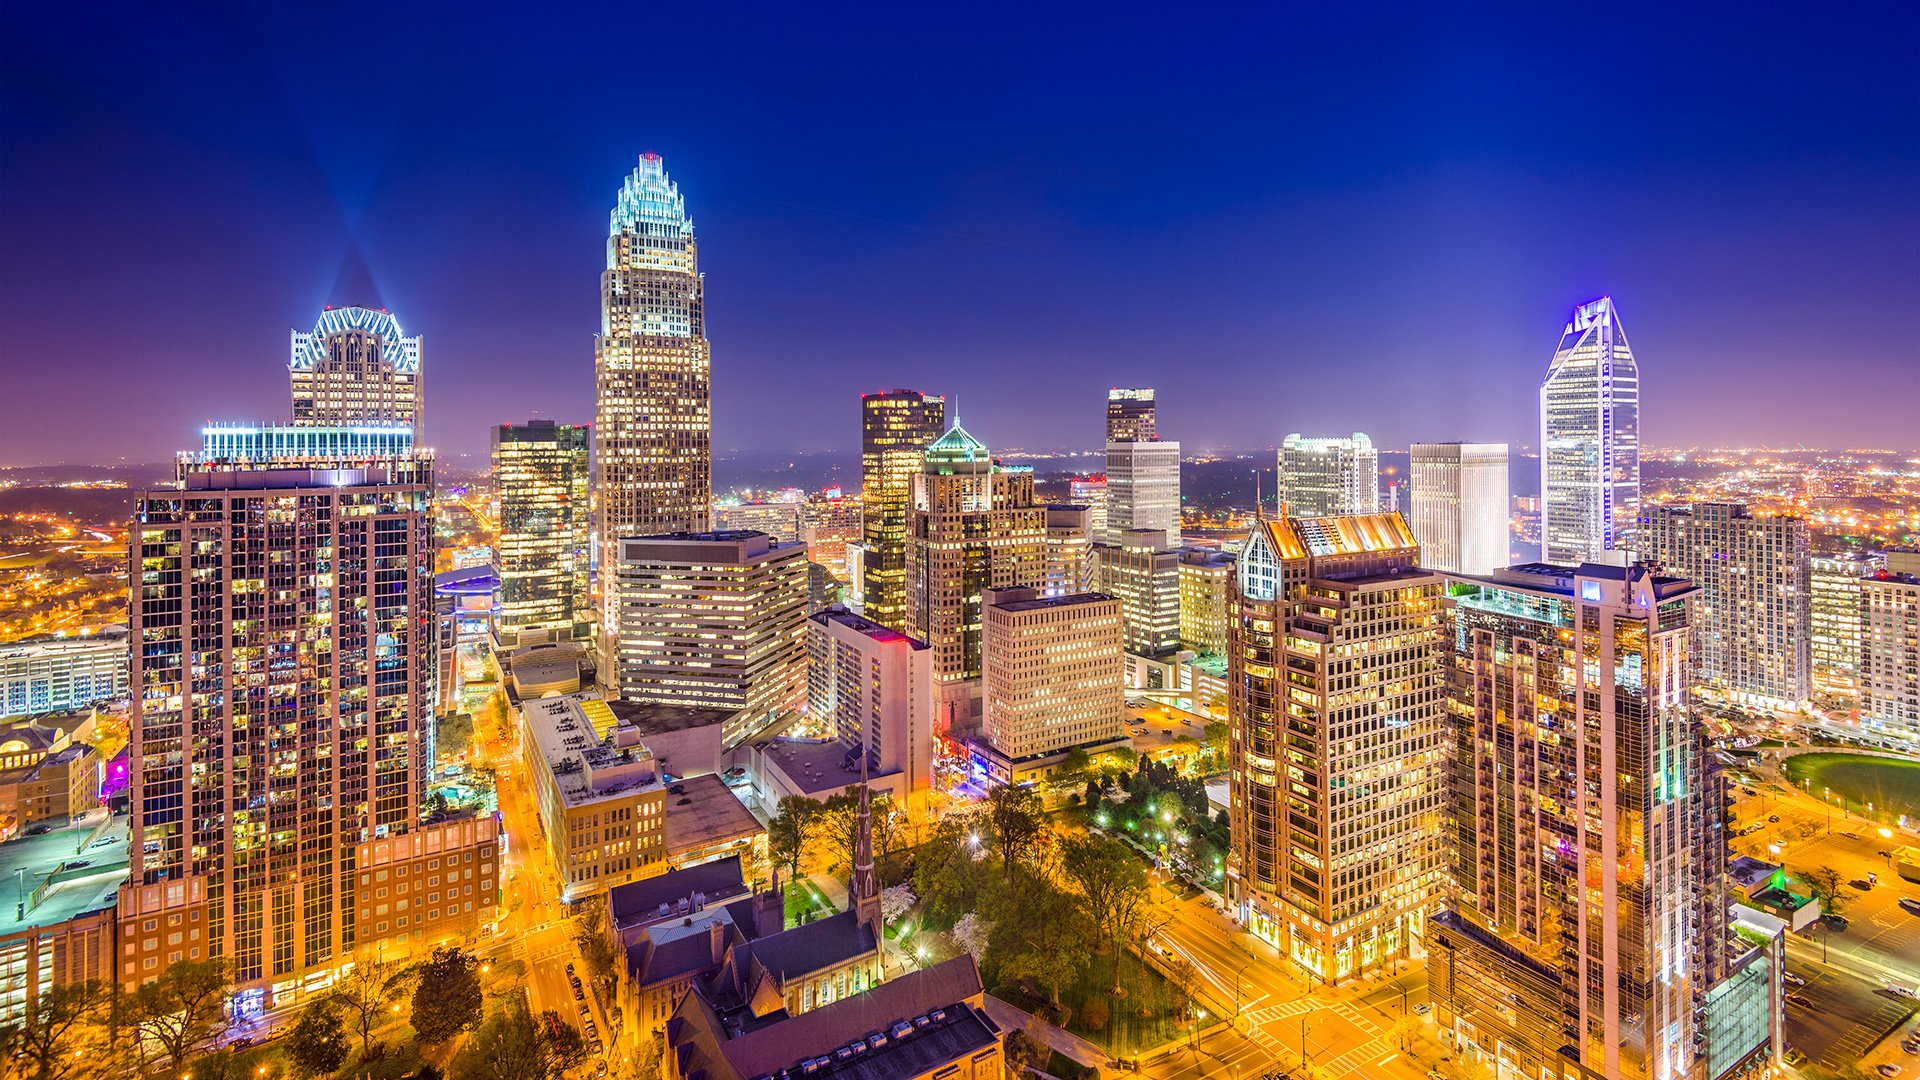 Pictured: Charlotte skyline